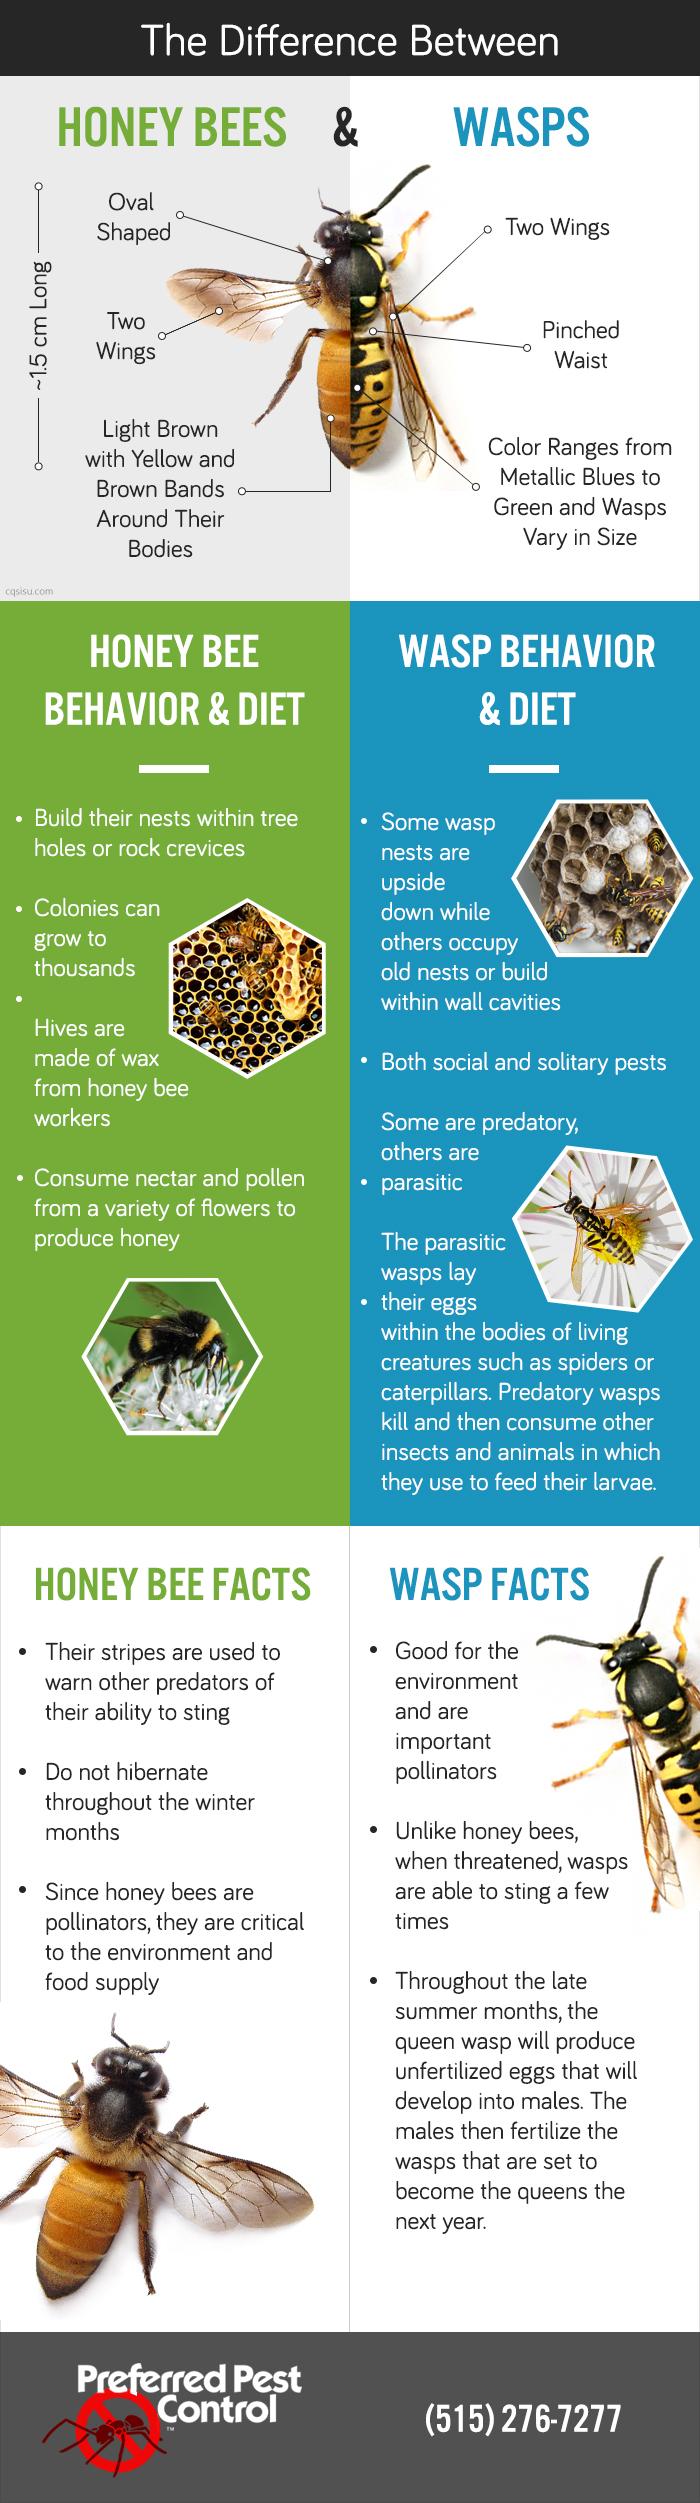 honeybee-and-wasps-updated